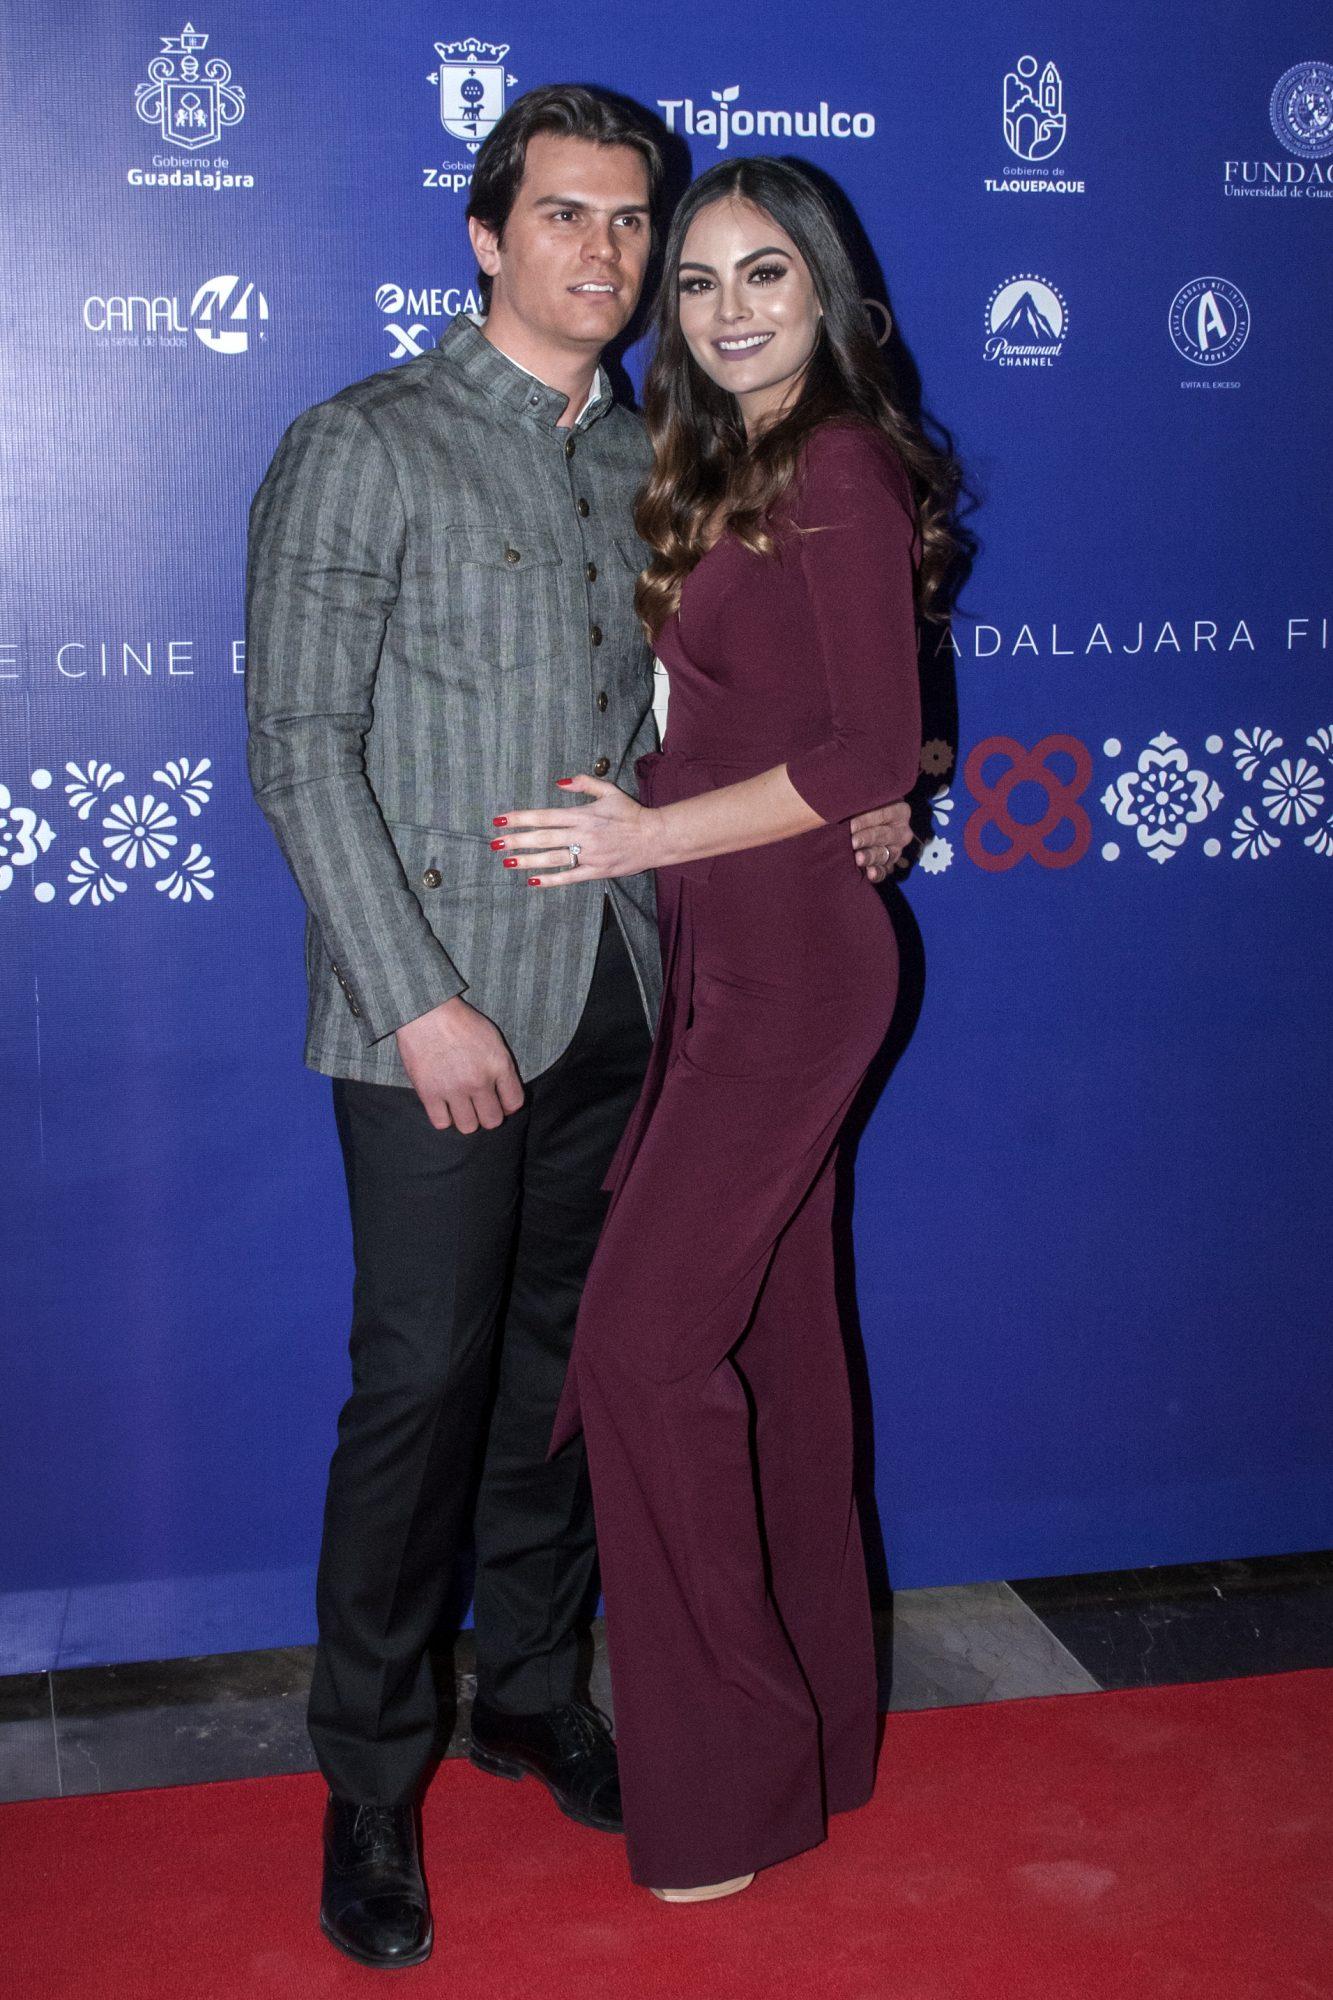 Juan Carlos Valladares and Ximena Navarrete